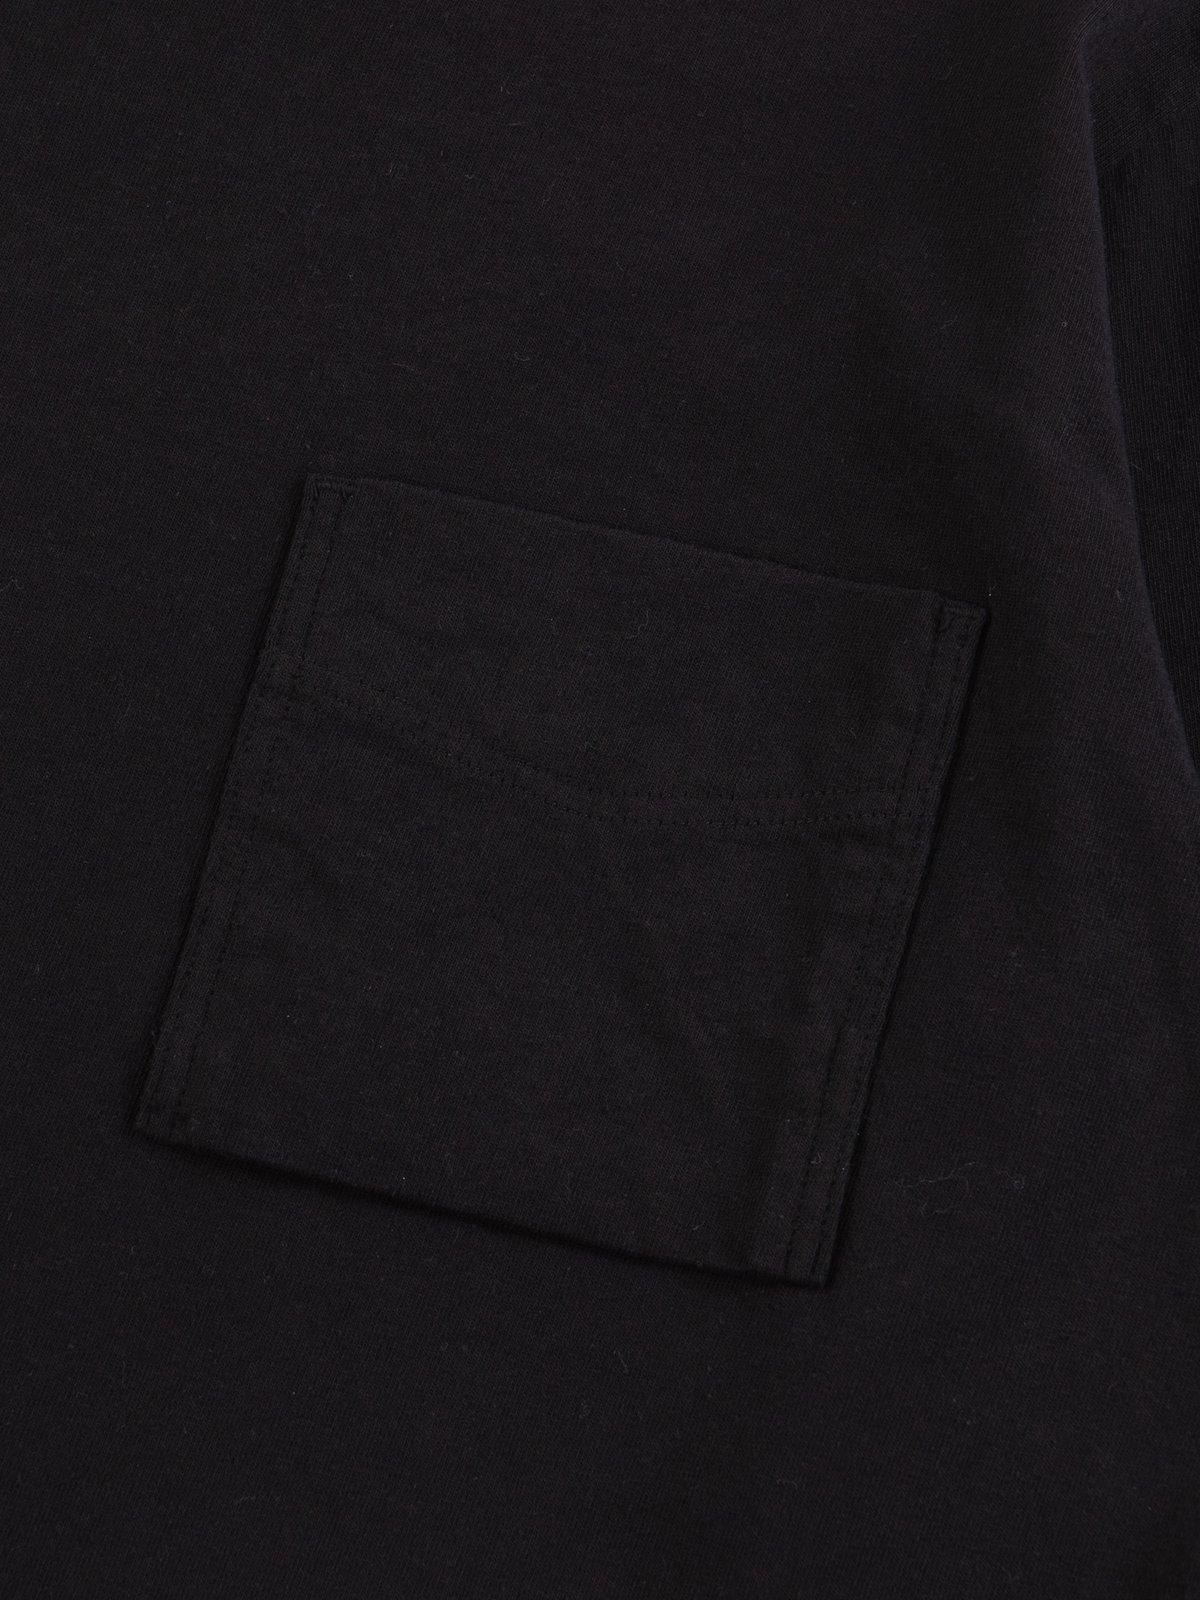 Black Long Sleeve Pocket T–Shirt - Image 5